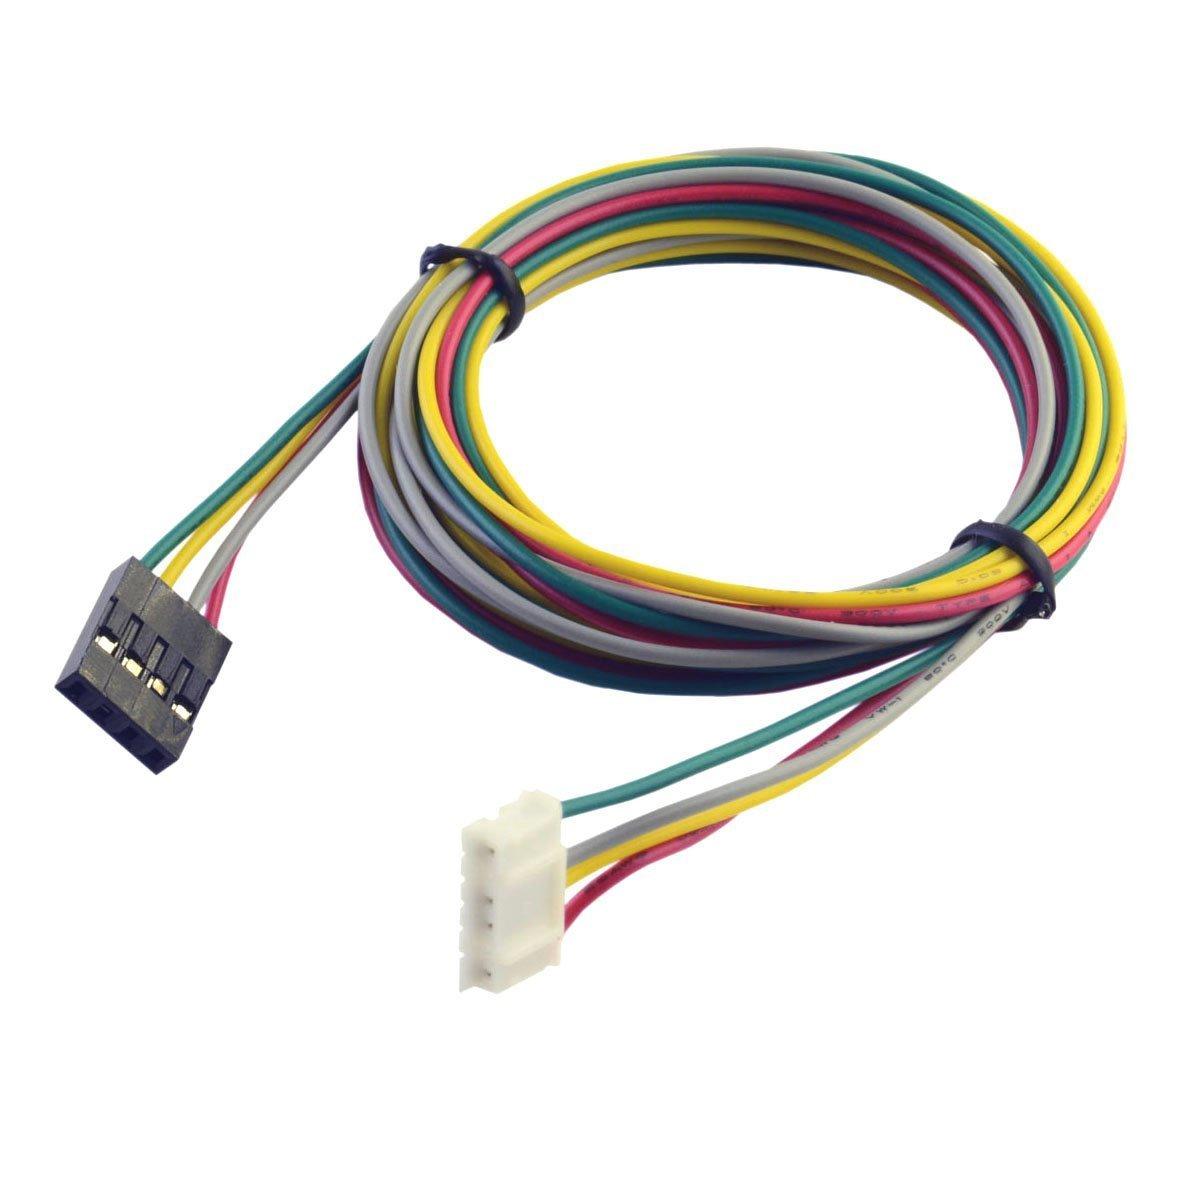 UEETEK 4 PCS 1M Stepper Motor Cables 4Pin for NEMA 17 Used in Reprap 3D Printers CNC Machines